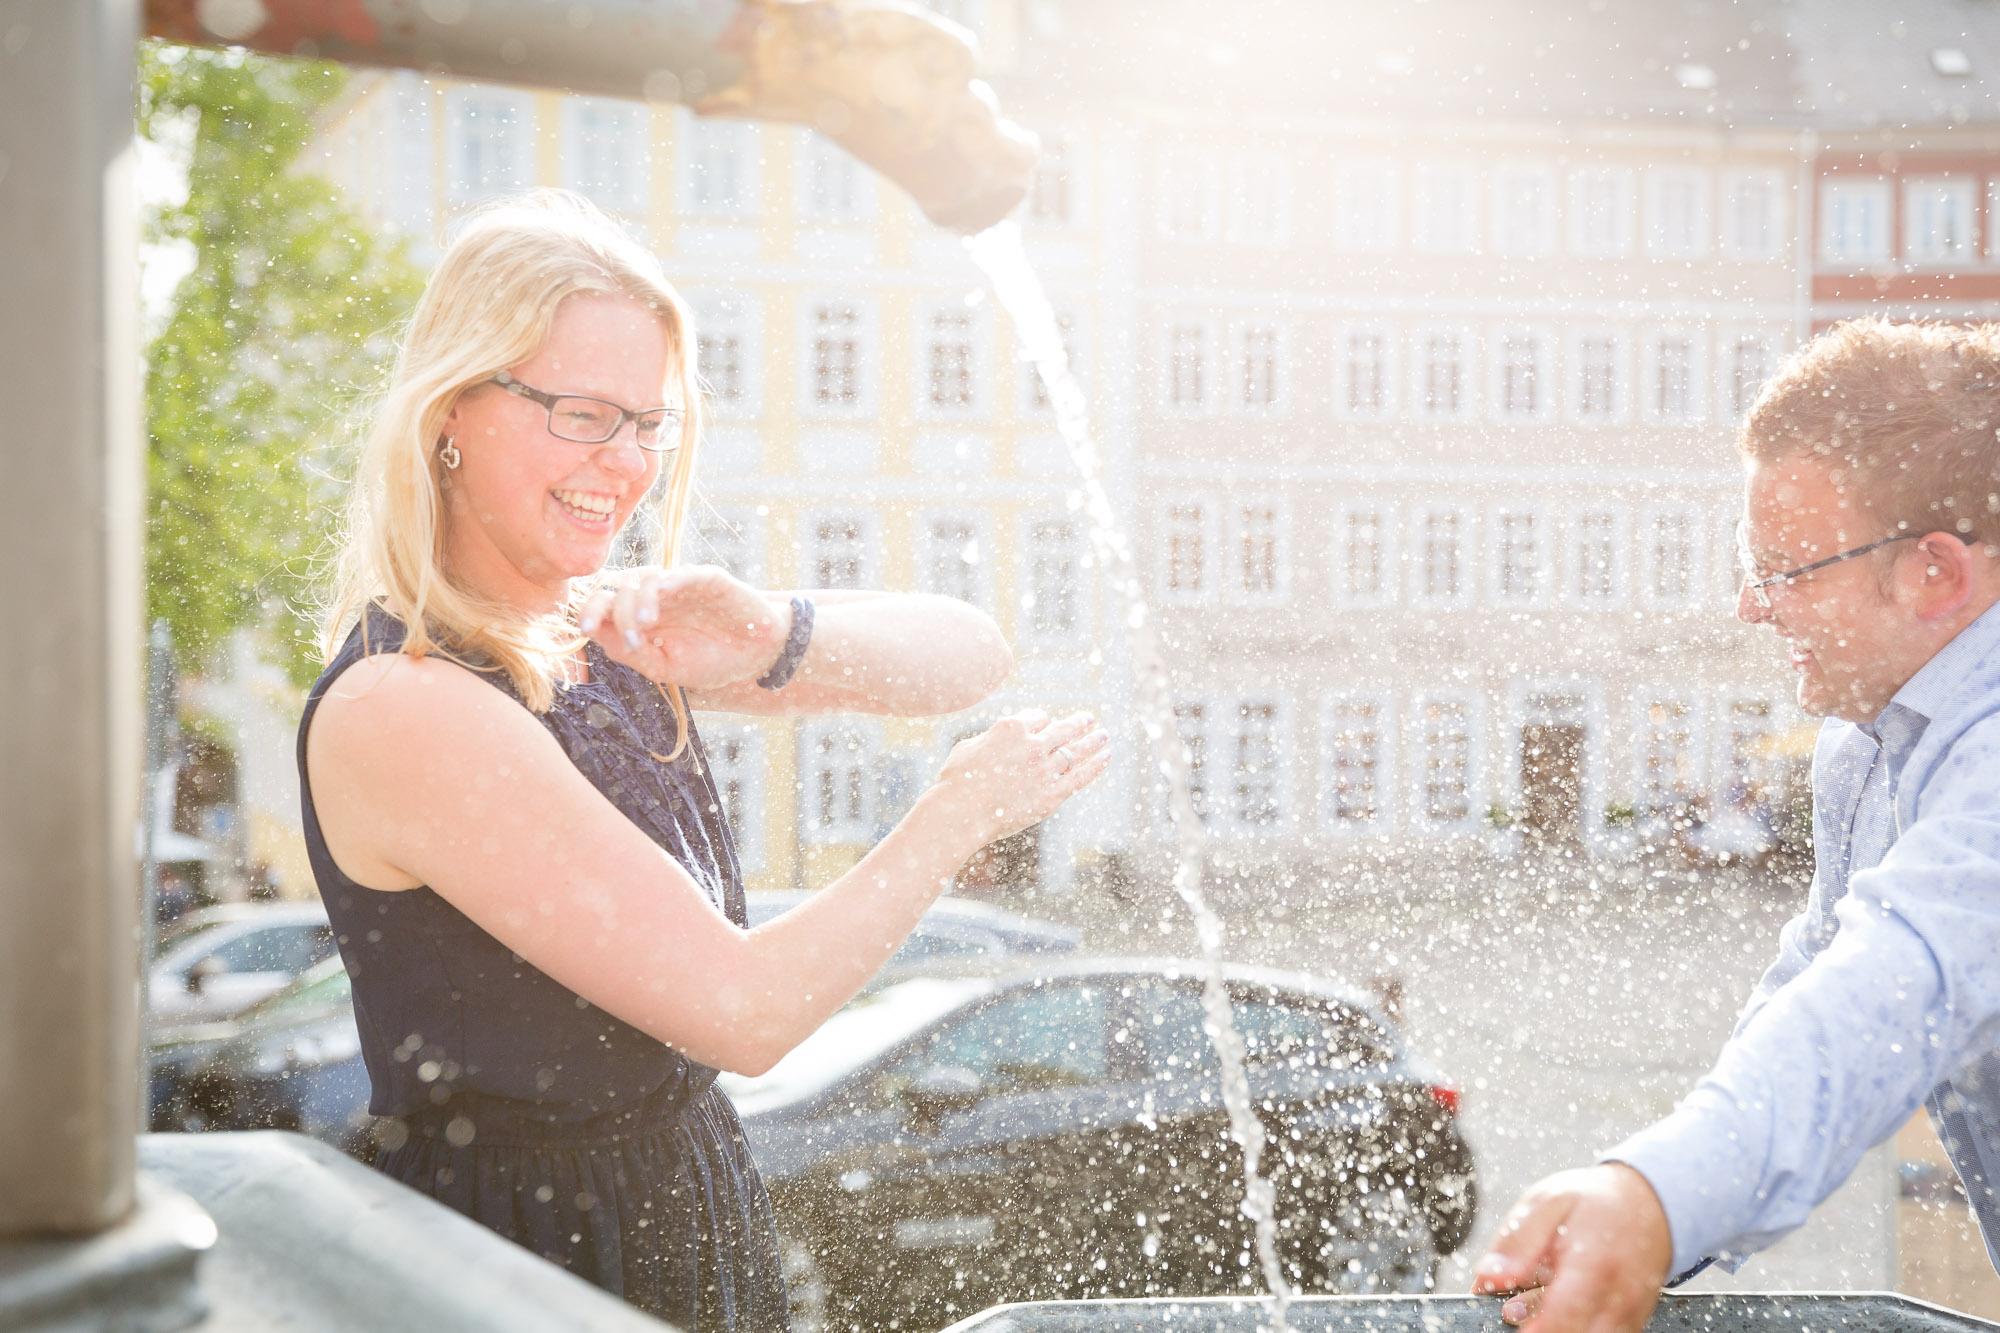 Fotoshooting Wetzlar| © Andreas Bender